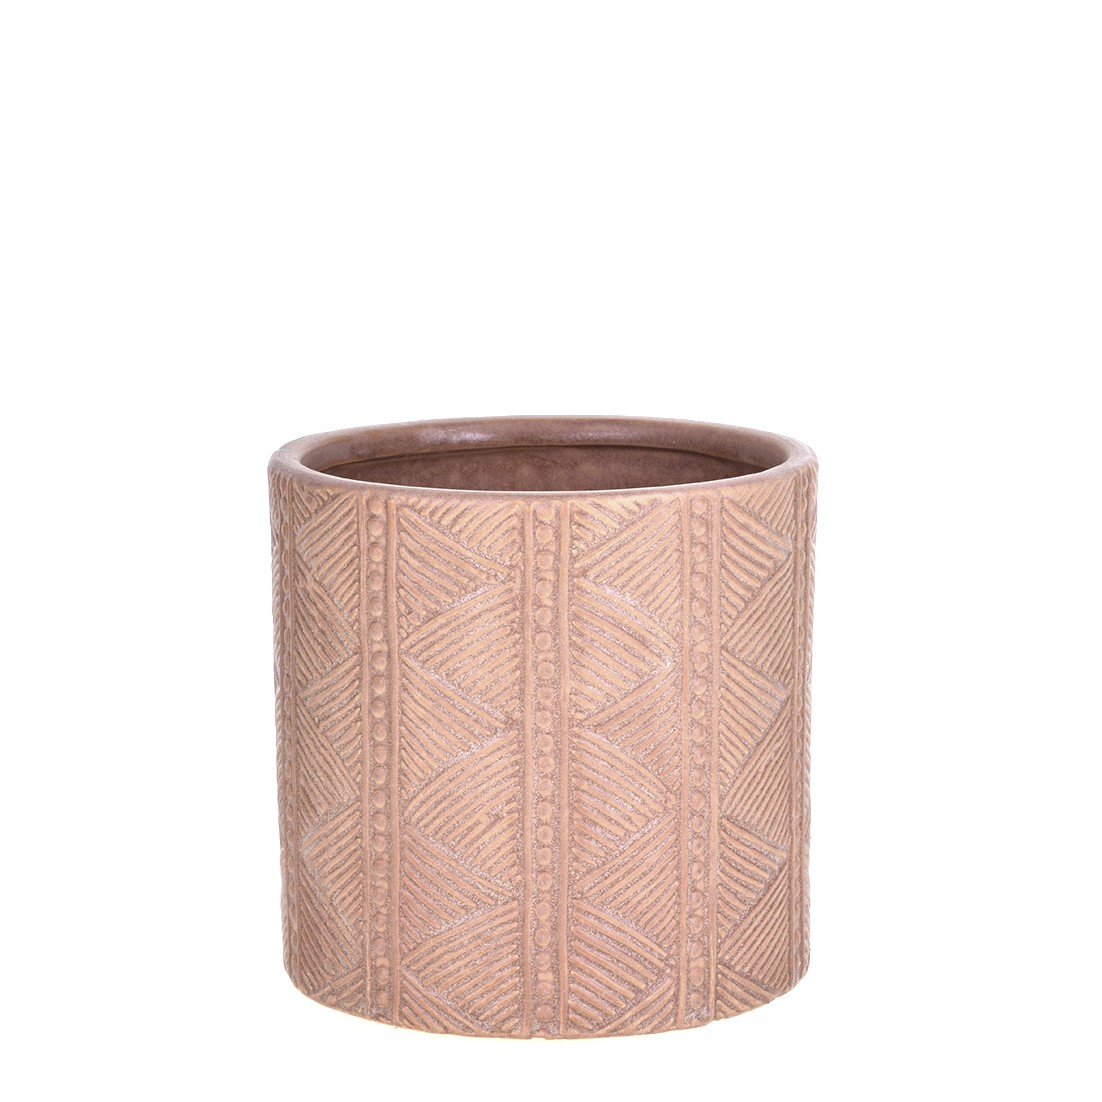 Vaso Decorativo de Ceramica Redondo Bali 13cm Terracota